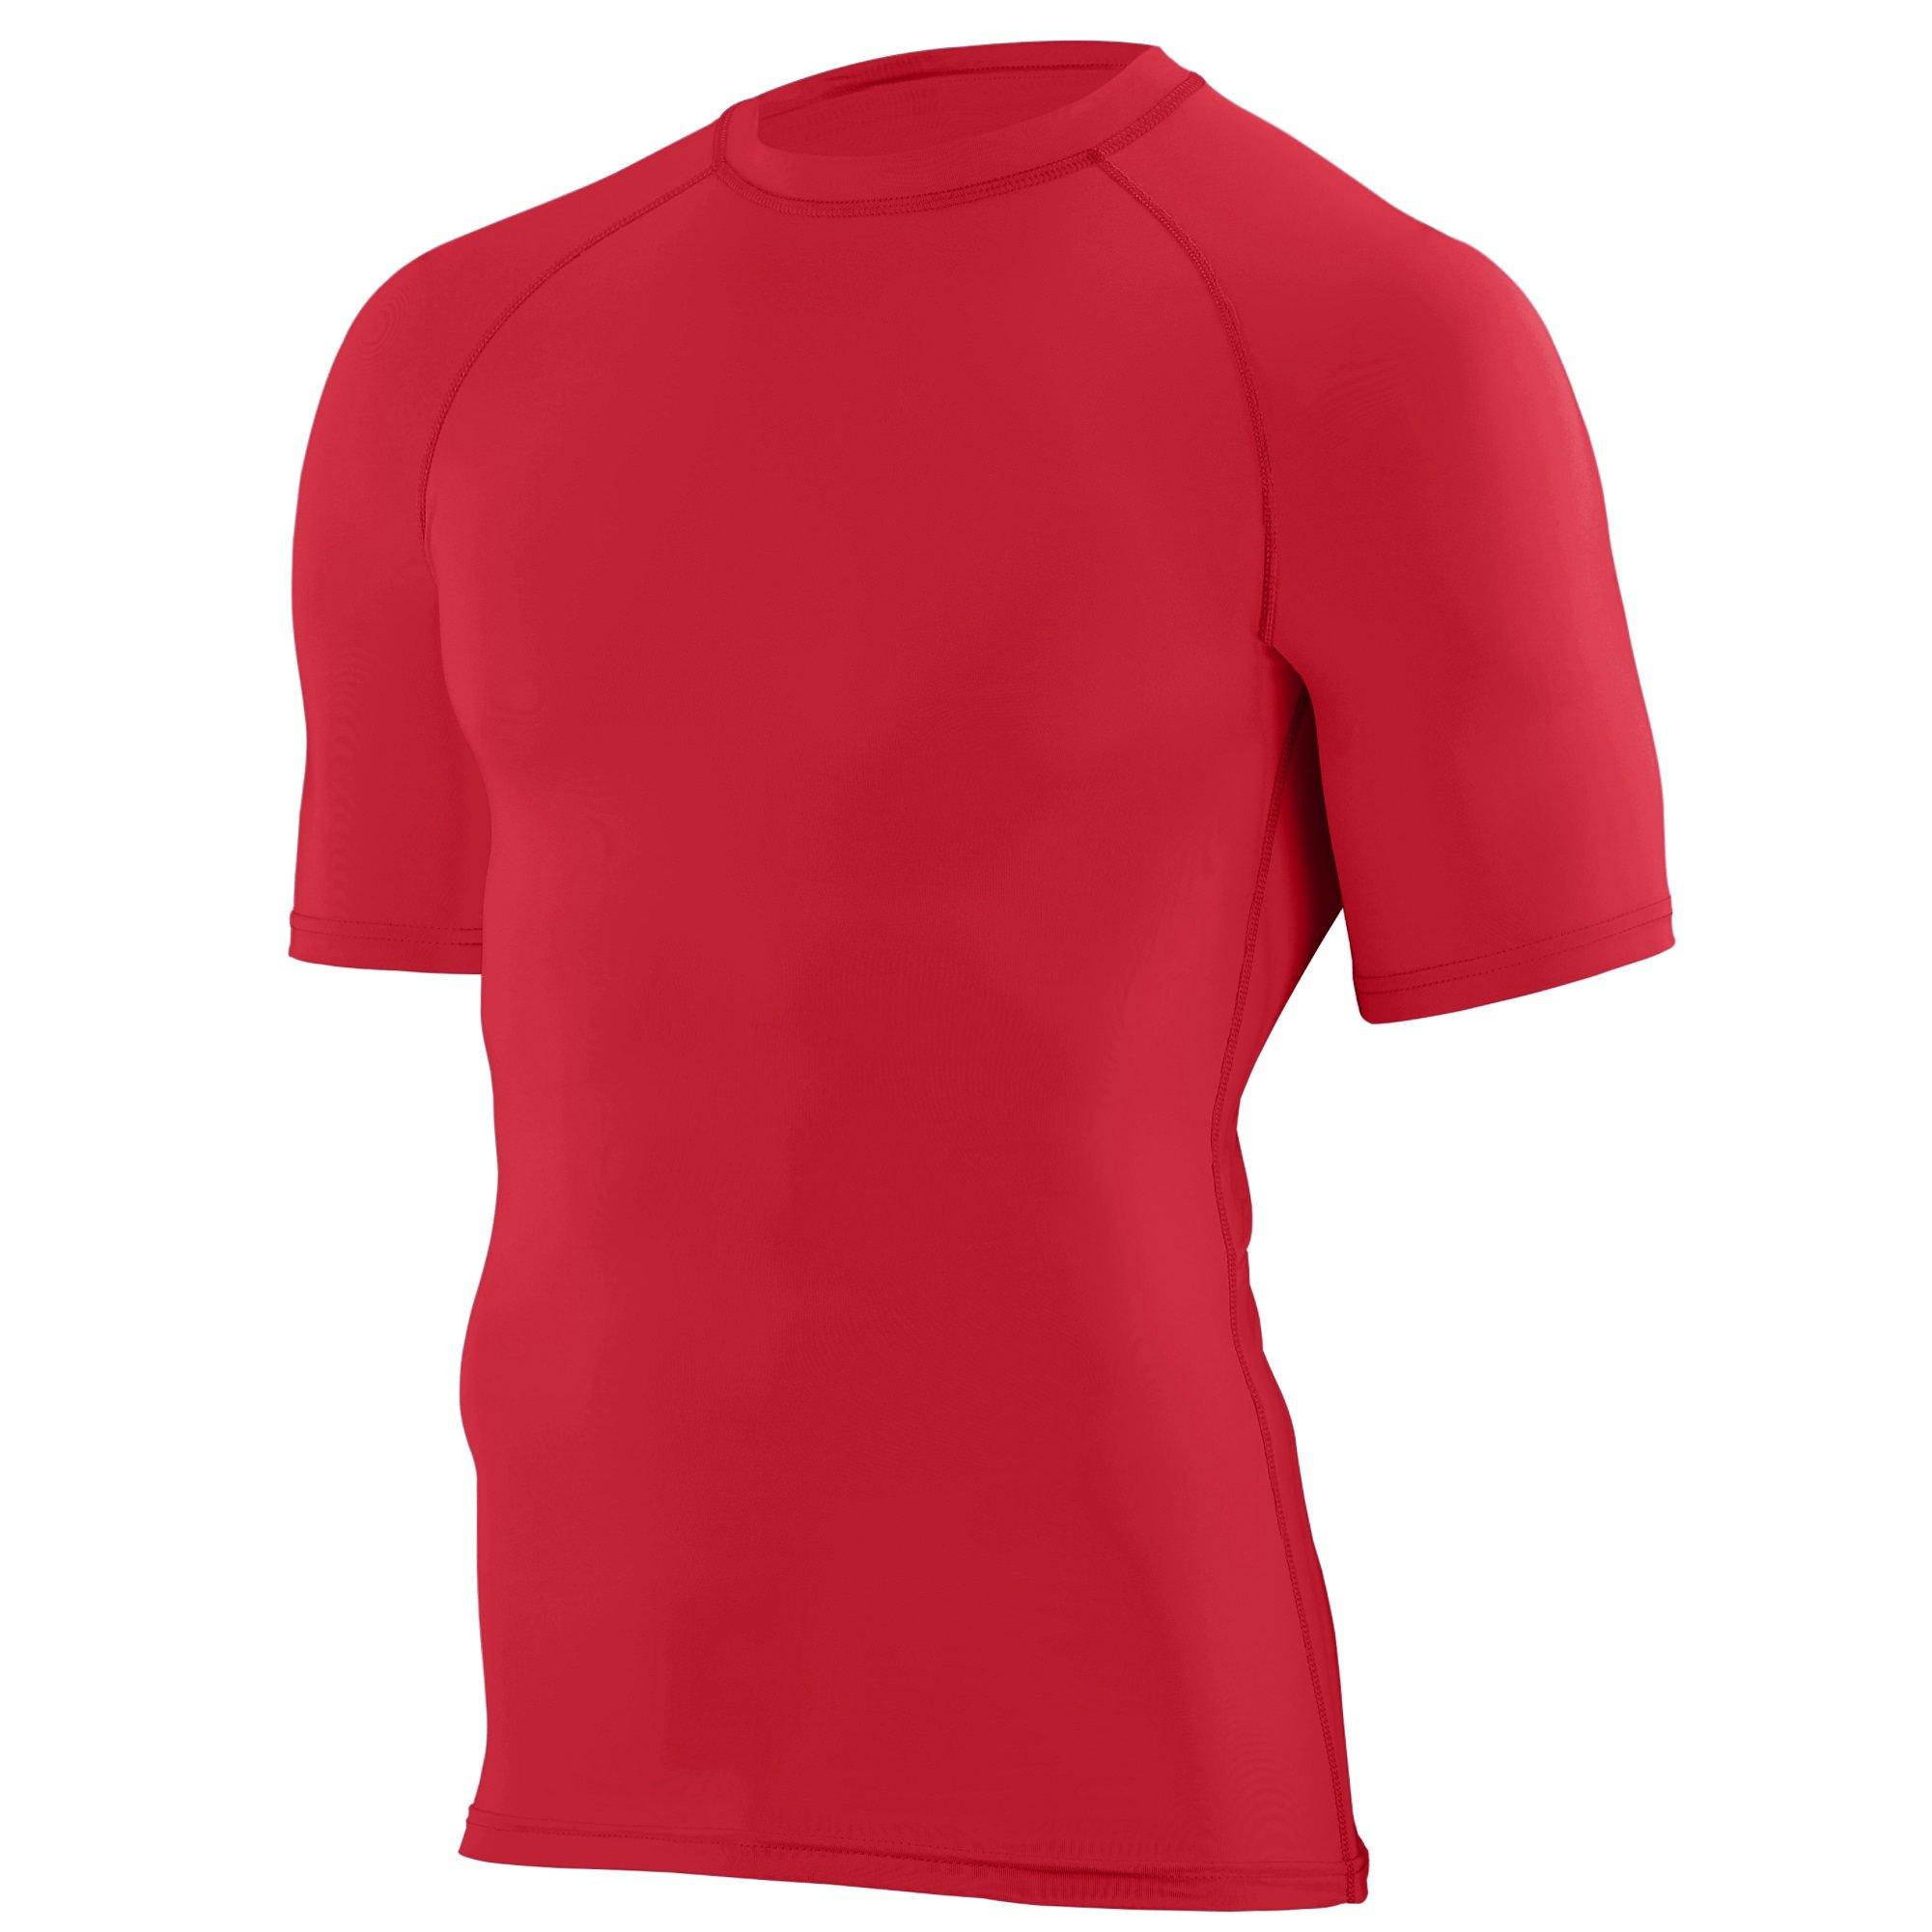 Augusta Sportswear Boys' Hyperform Compression Short Sleeve Shirt S Red